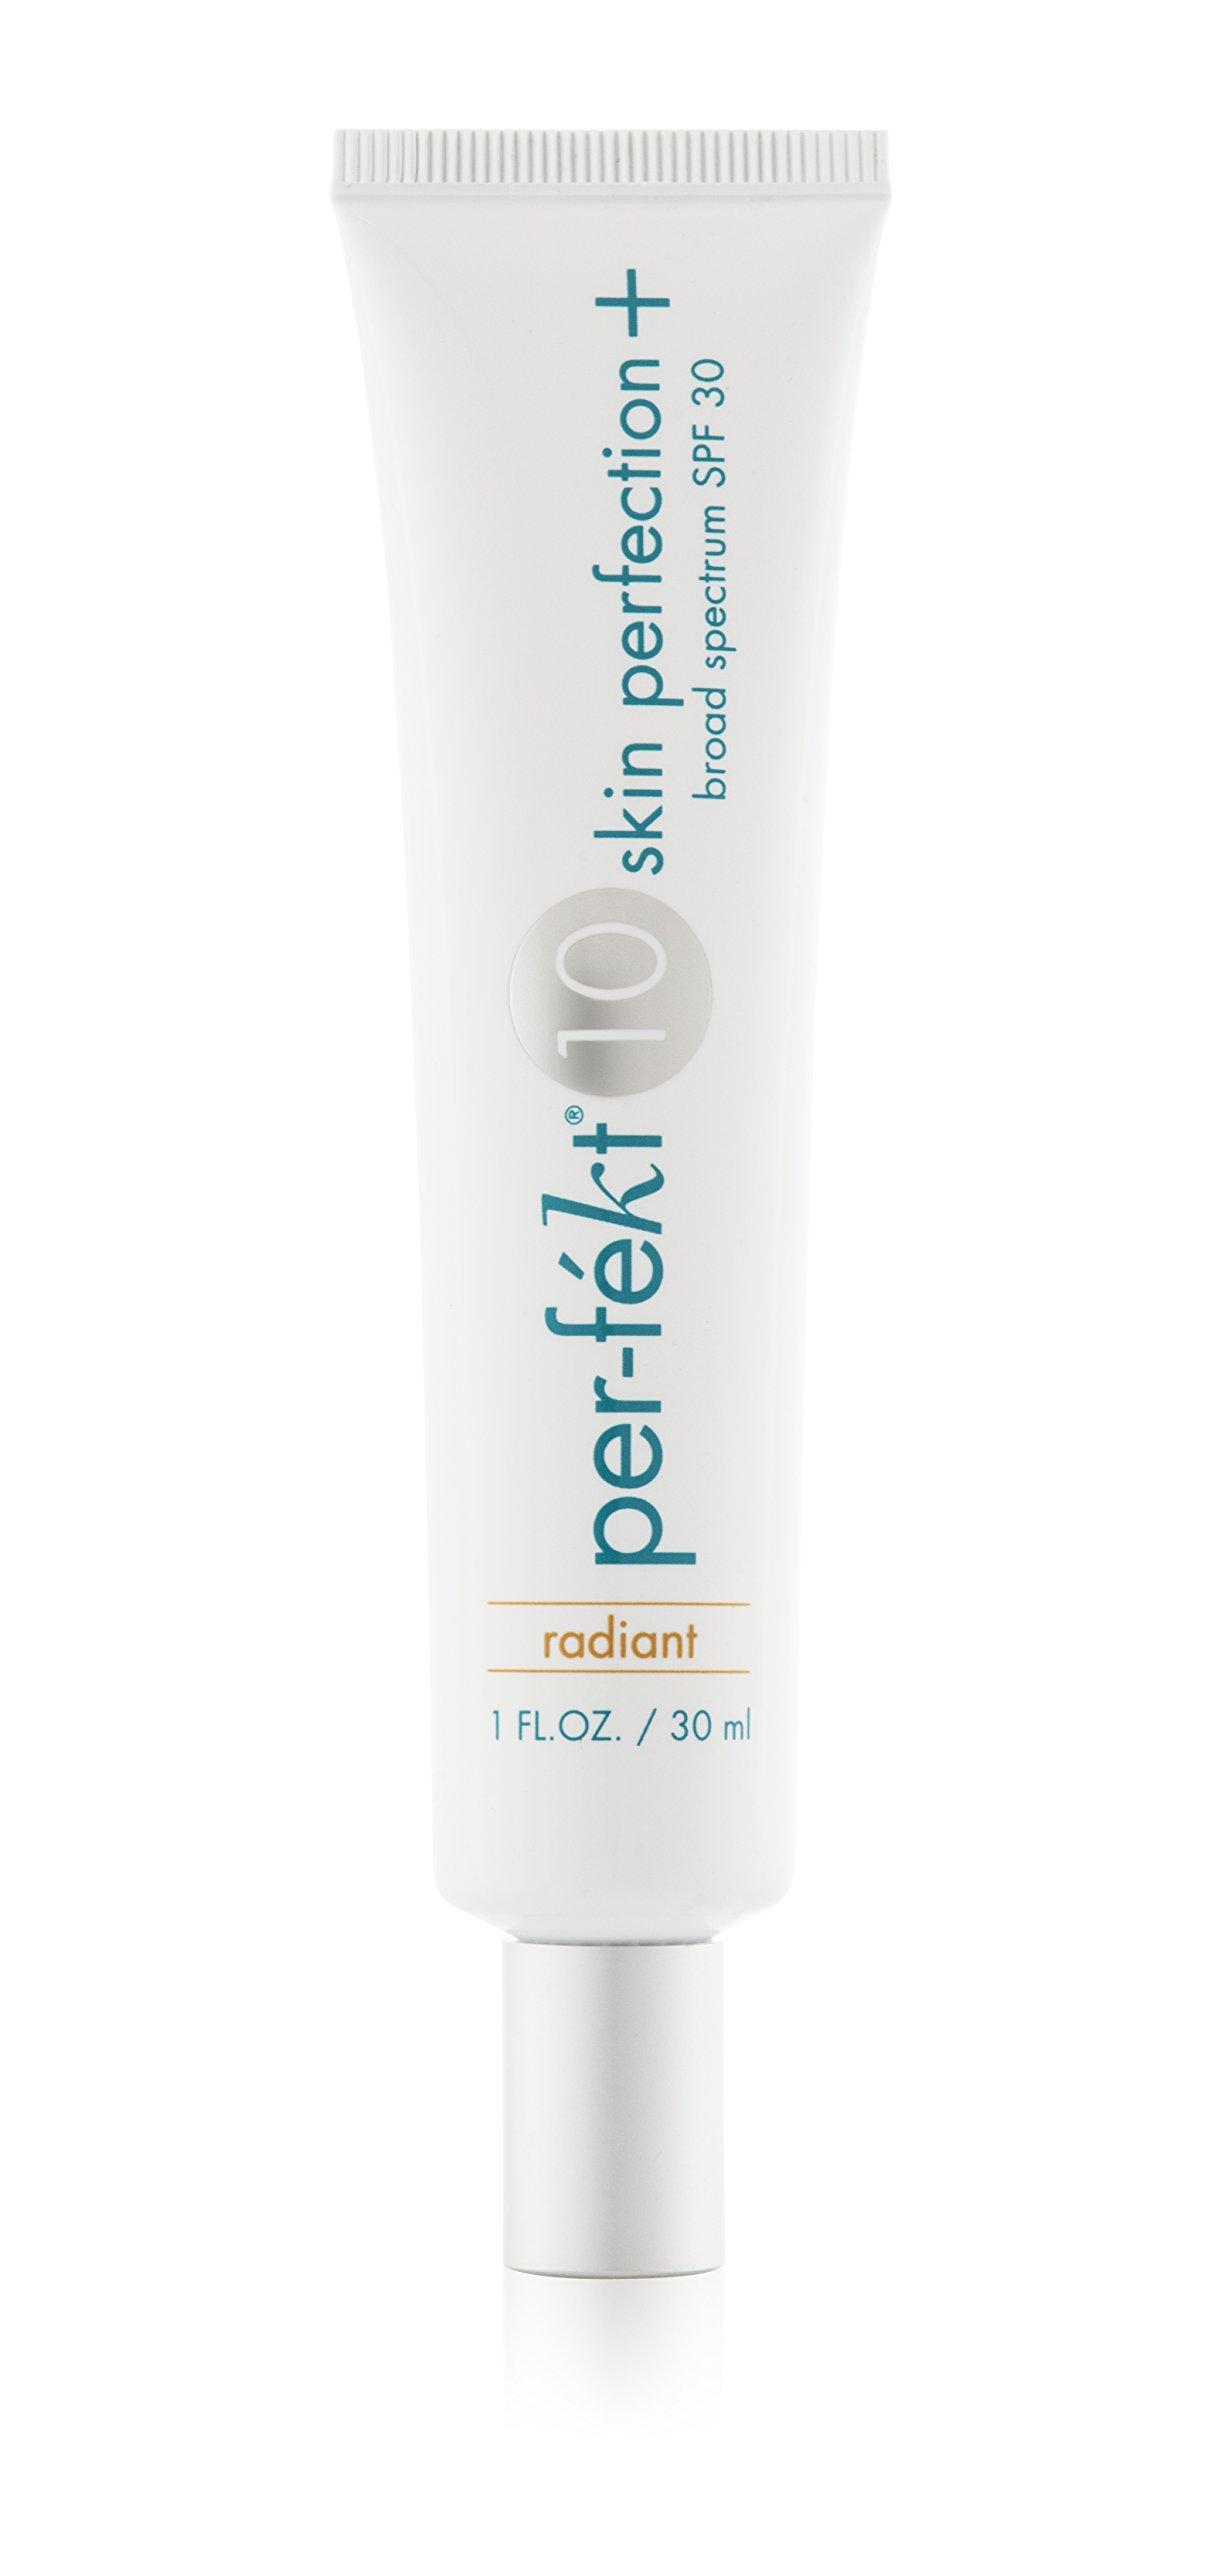 Per-fekt Skin Perfection Gel - Radiant - 1 3 Pk Dr. Dans All Natural Hypoallergenic Lip Balm Chemical/PABA Free .14oz Ea